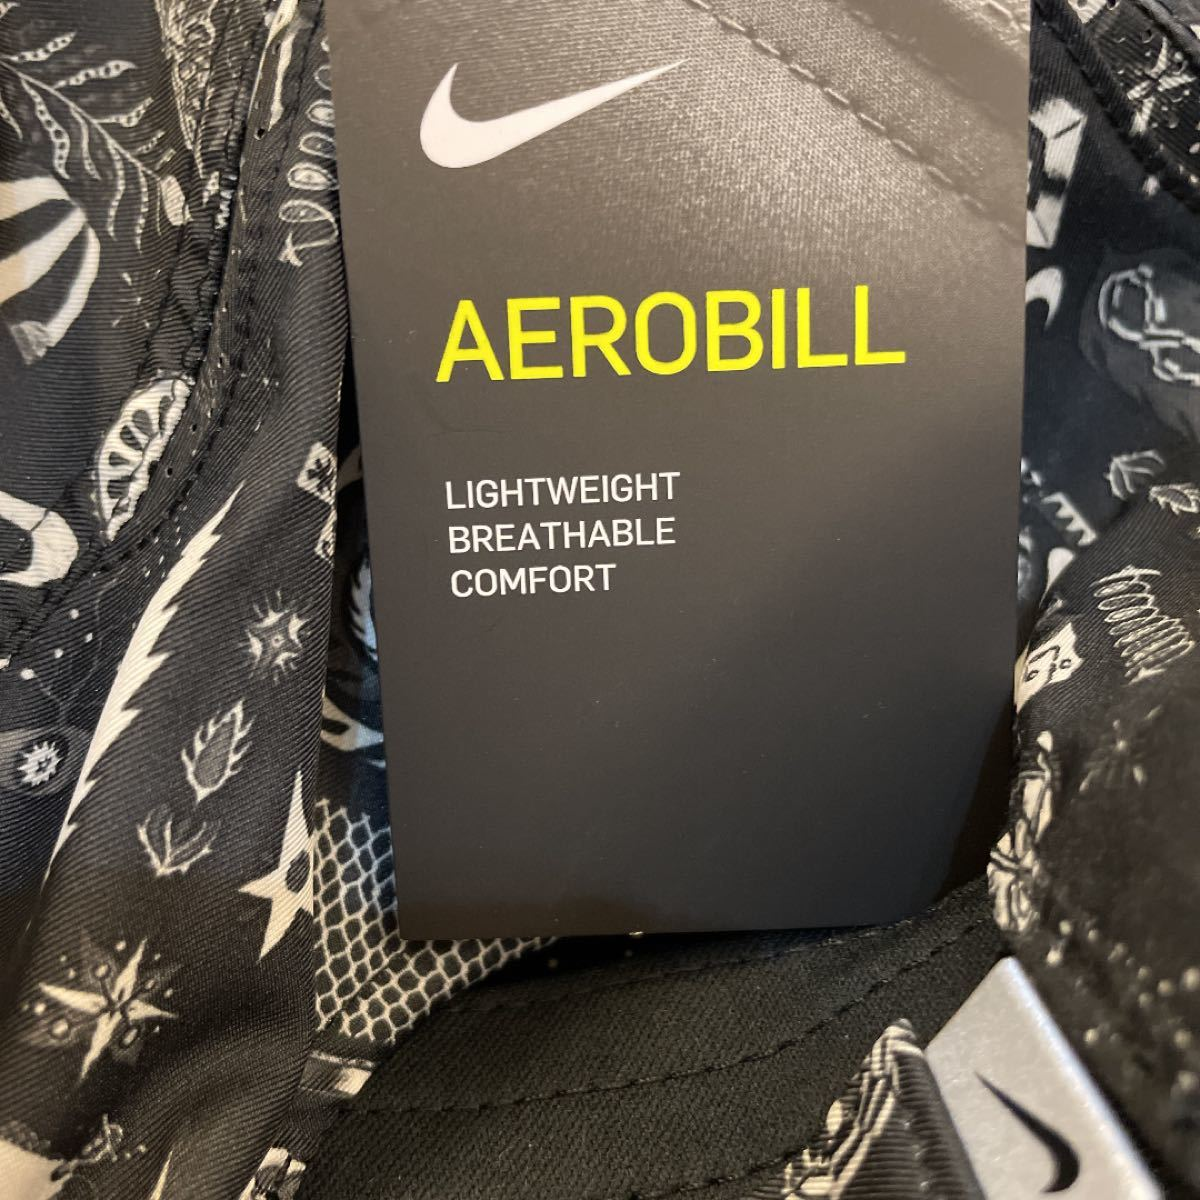 Nike ナイキ エアロビル ランニング キャップ マラソン トレーニング ジム